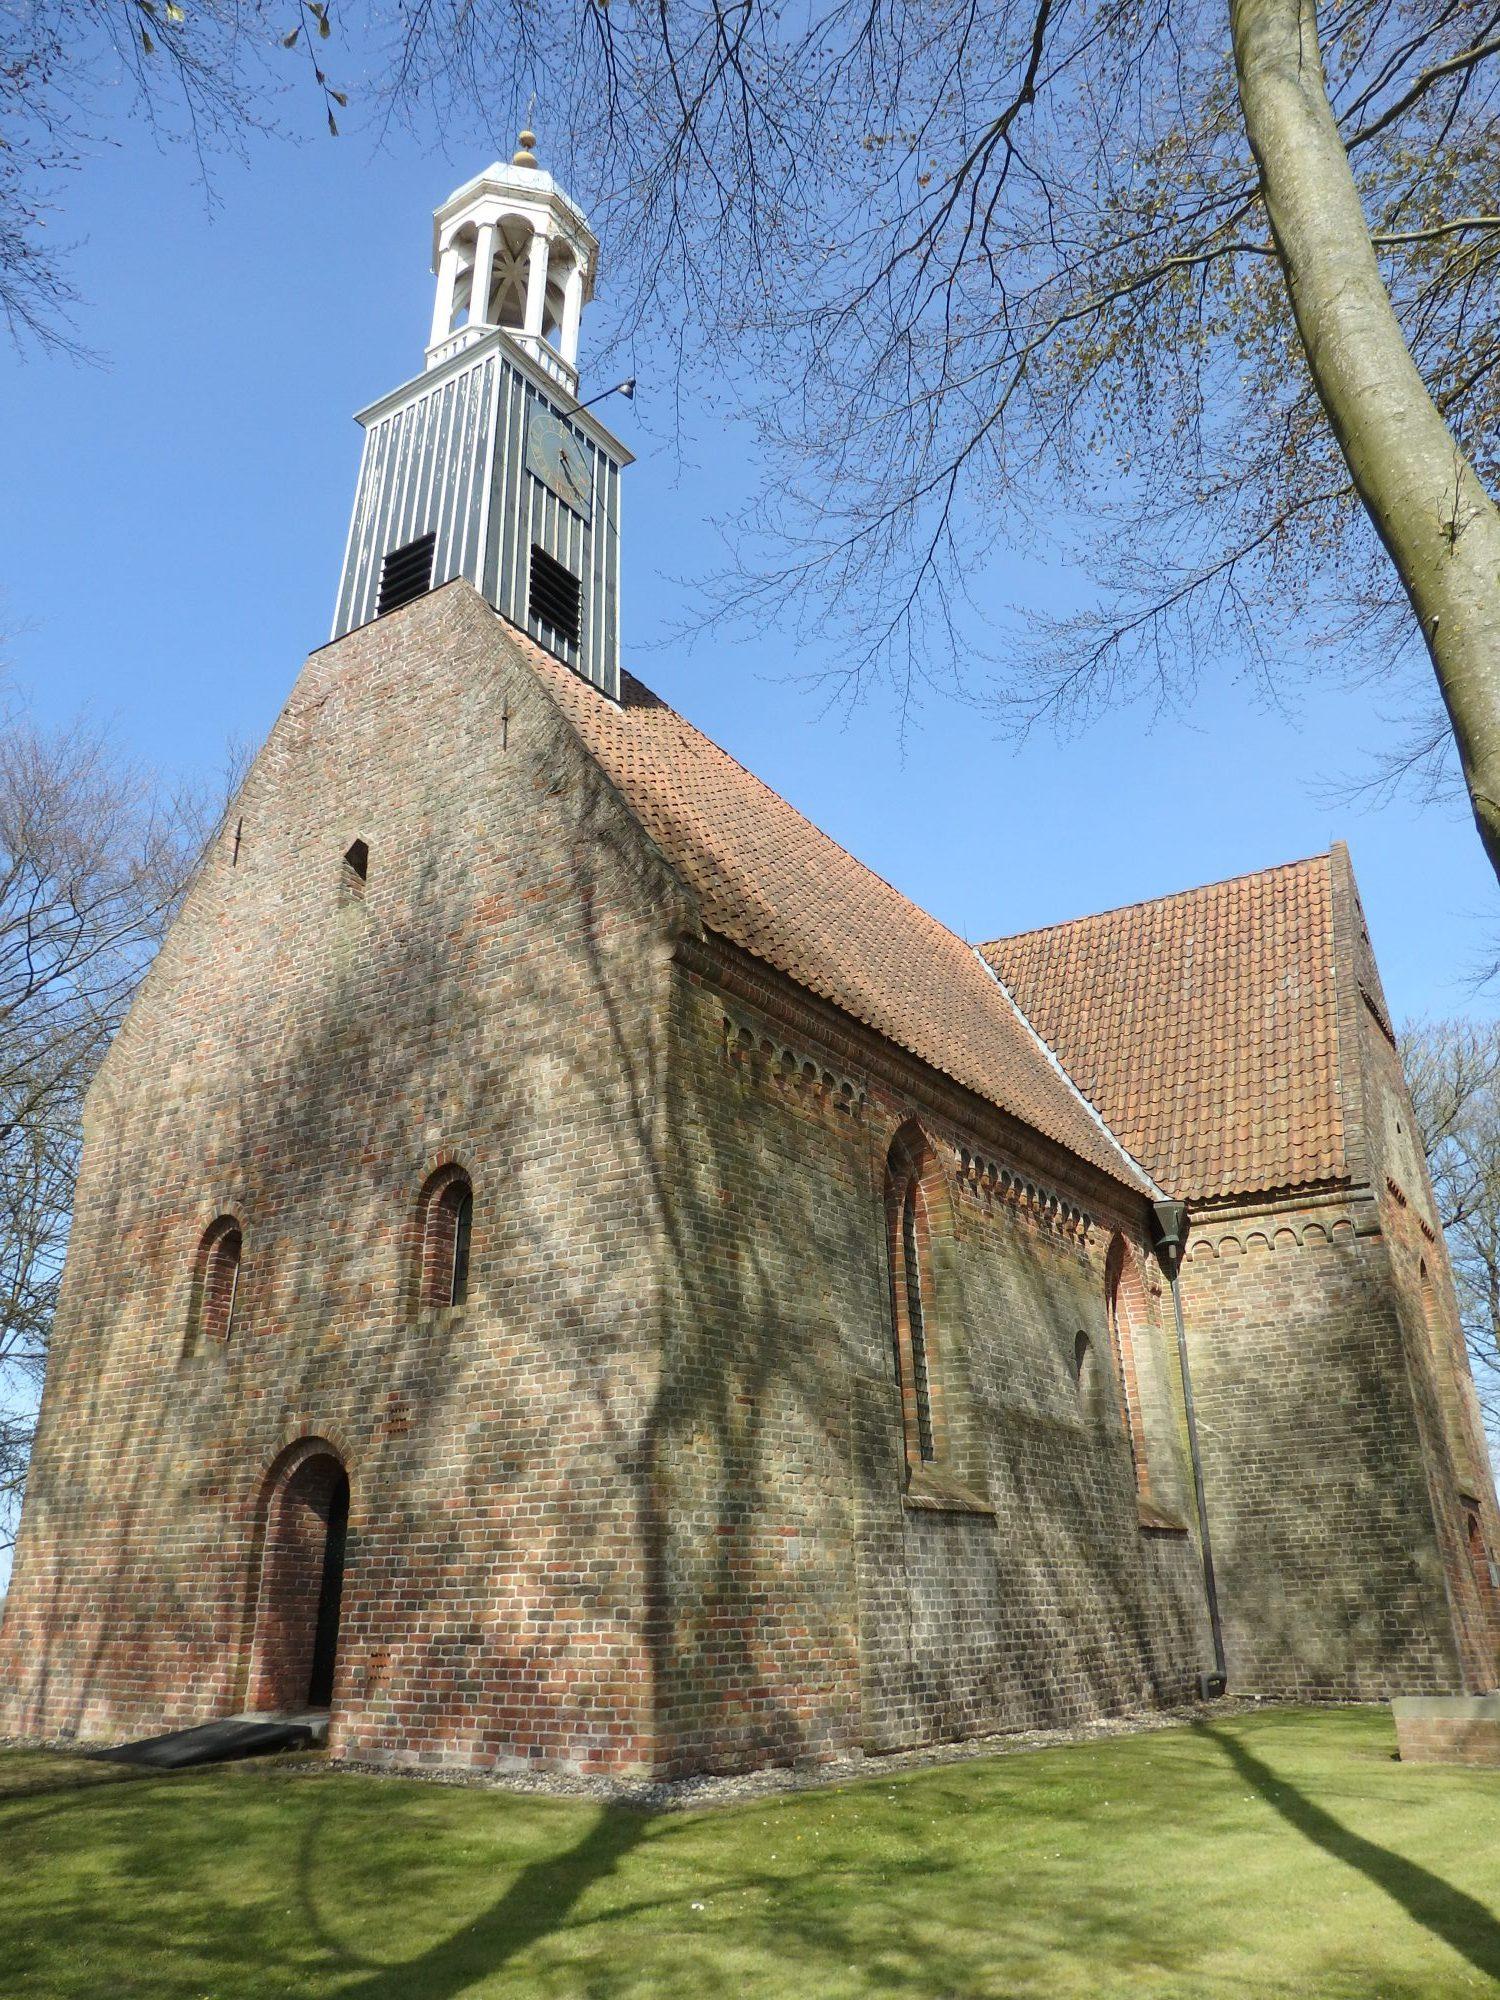 Leermens church in Groningen province